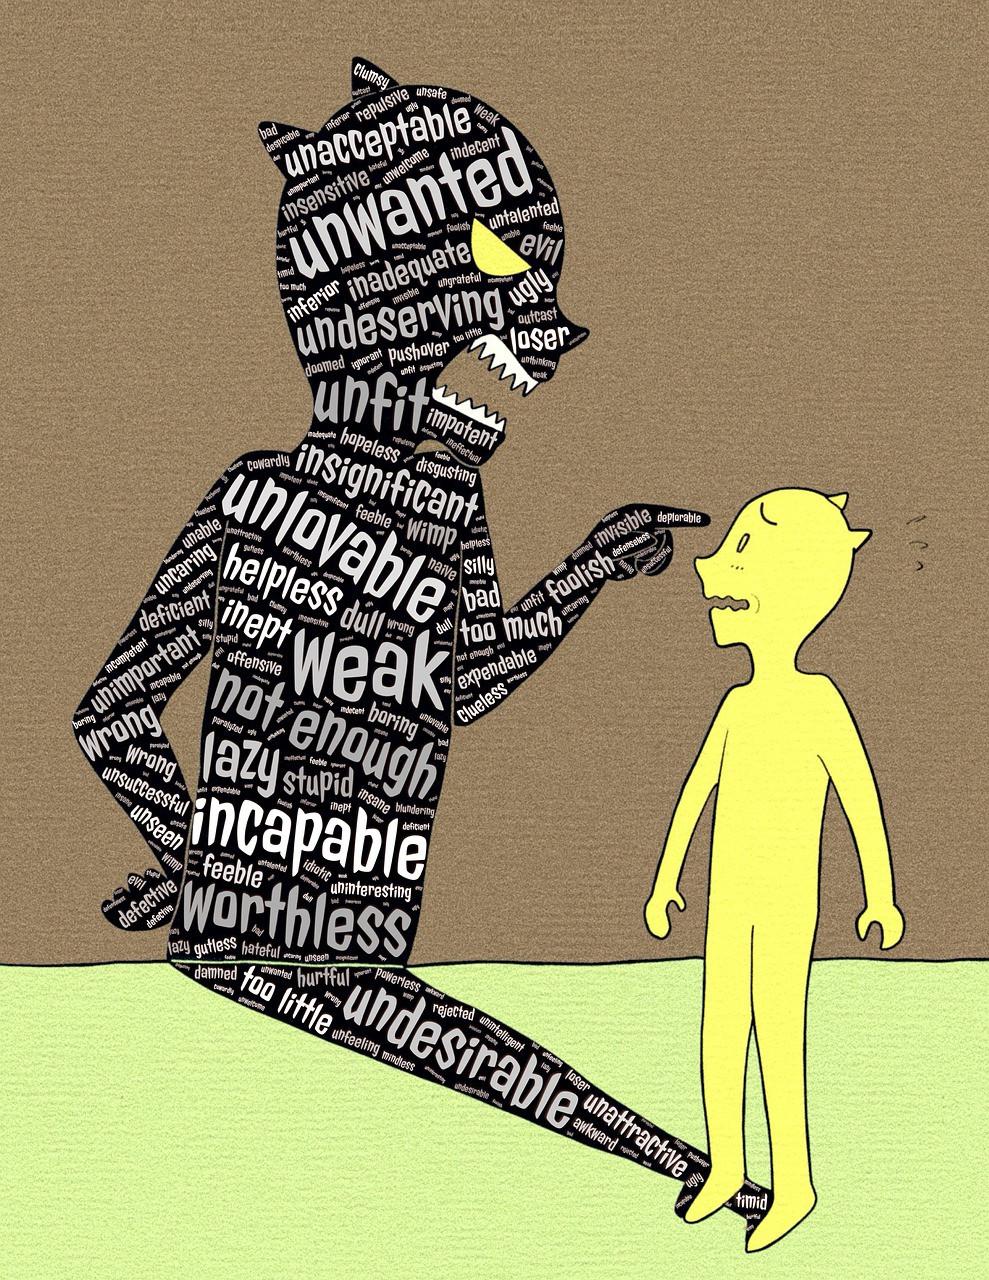 "Image by <a href=""https://pixabay.com/users/johnhain-352999/?utm_source=link-attribution&amp;utm_medium=referral&amp;utm_campaign=image&amp;utm_content=5079378"">John Hain</a> from <a href=""https://pixabay.com/?utm_source=link-attribution&amp;utm_medium=referral&amp;utm_campaign=image&amp;utm_content=5079378"">Pixabay</a>"